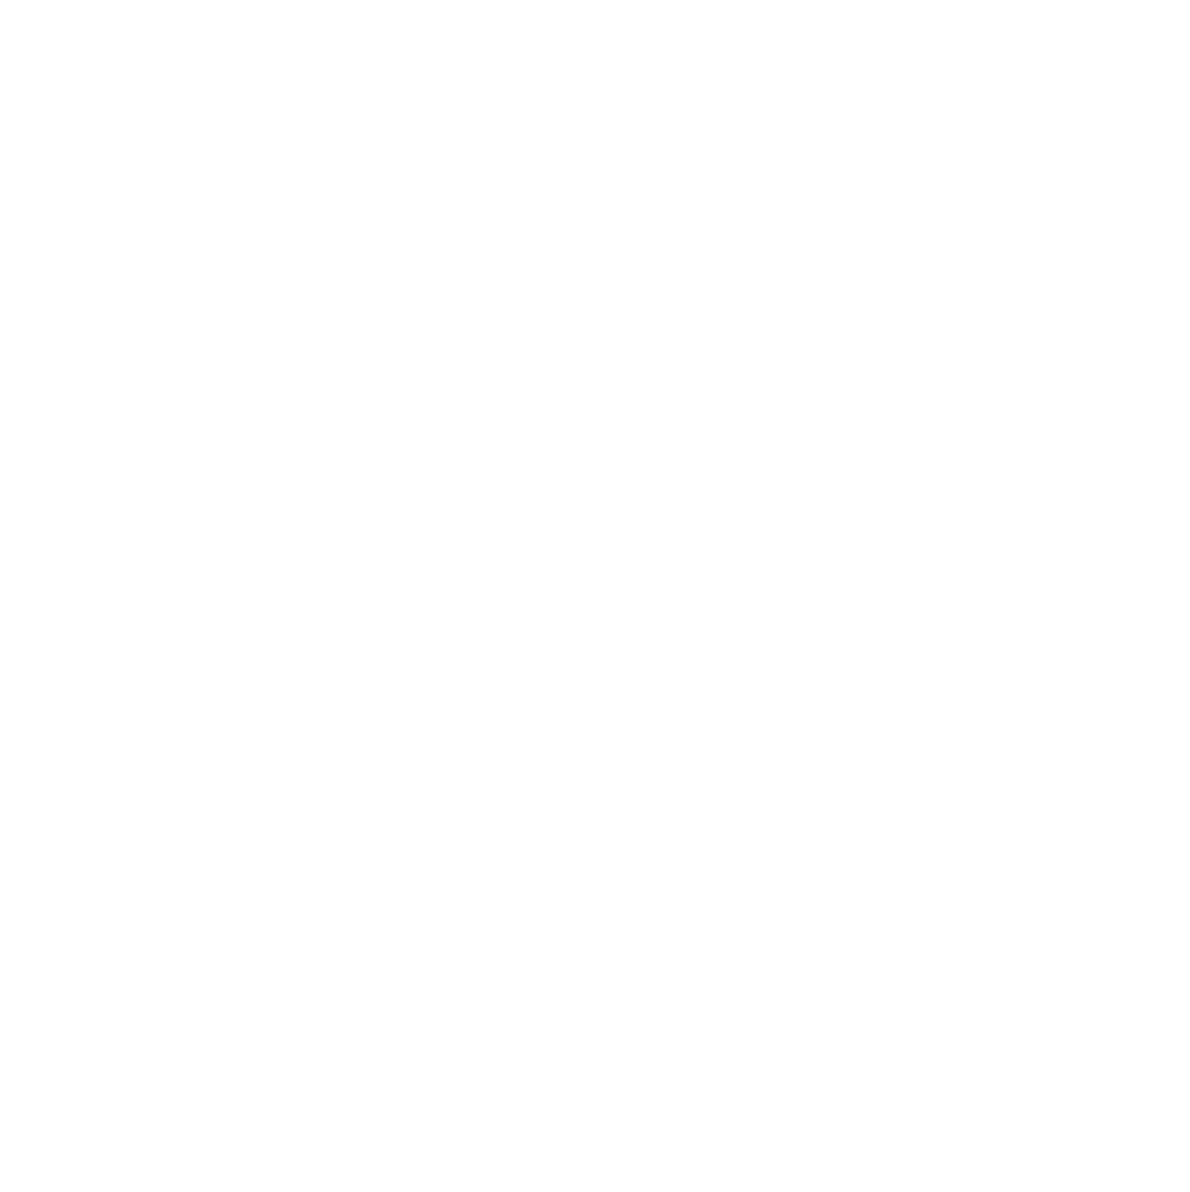 Watermelon clipart colour. Creative design for licensors